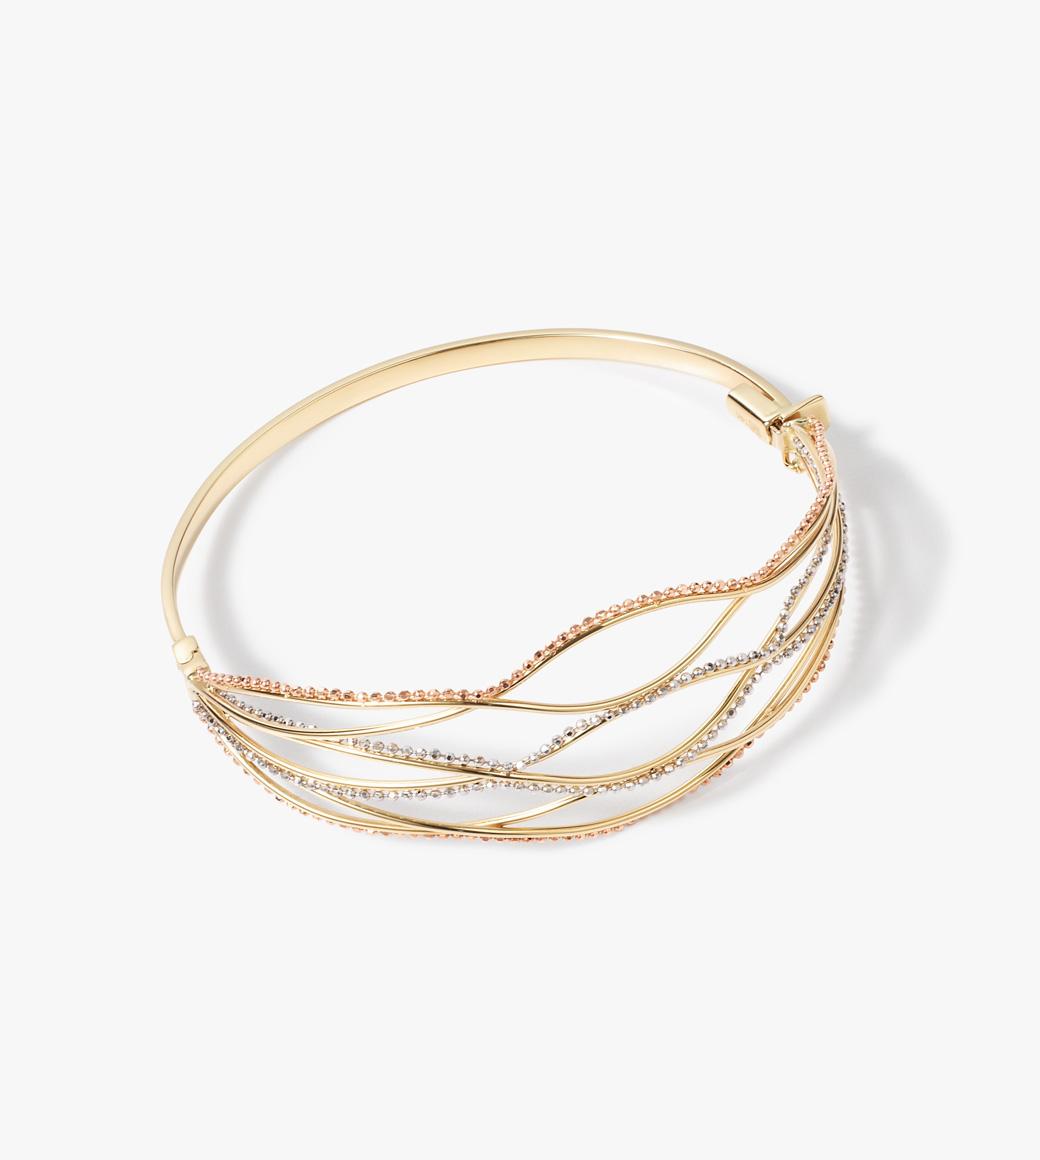 Fine Jewelry Gifts